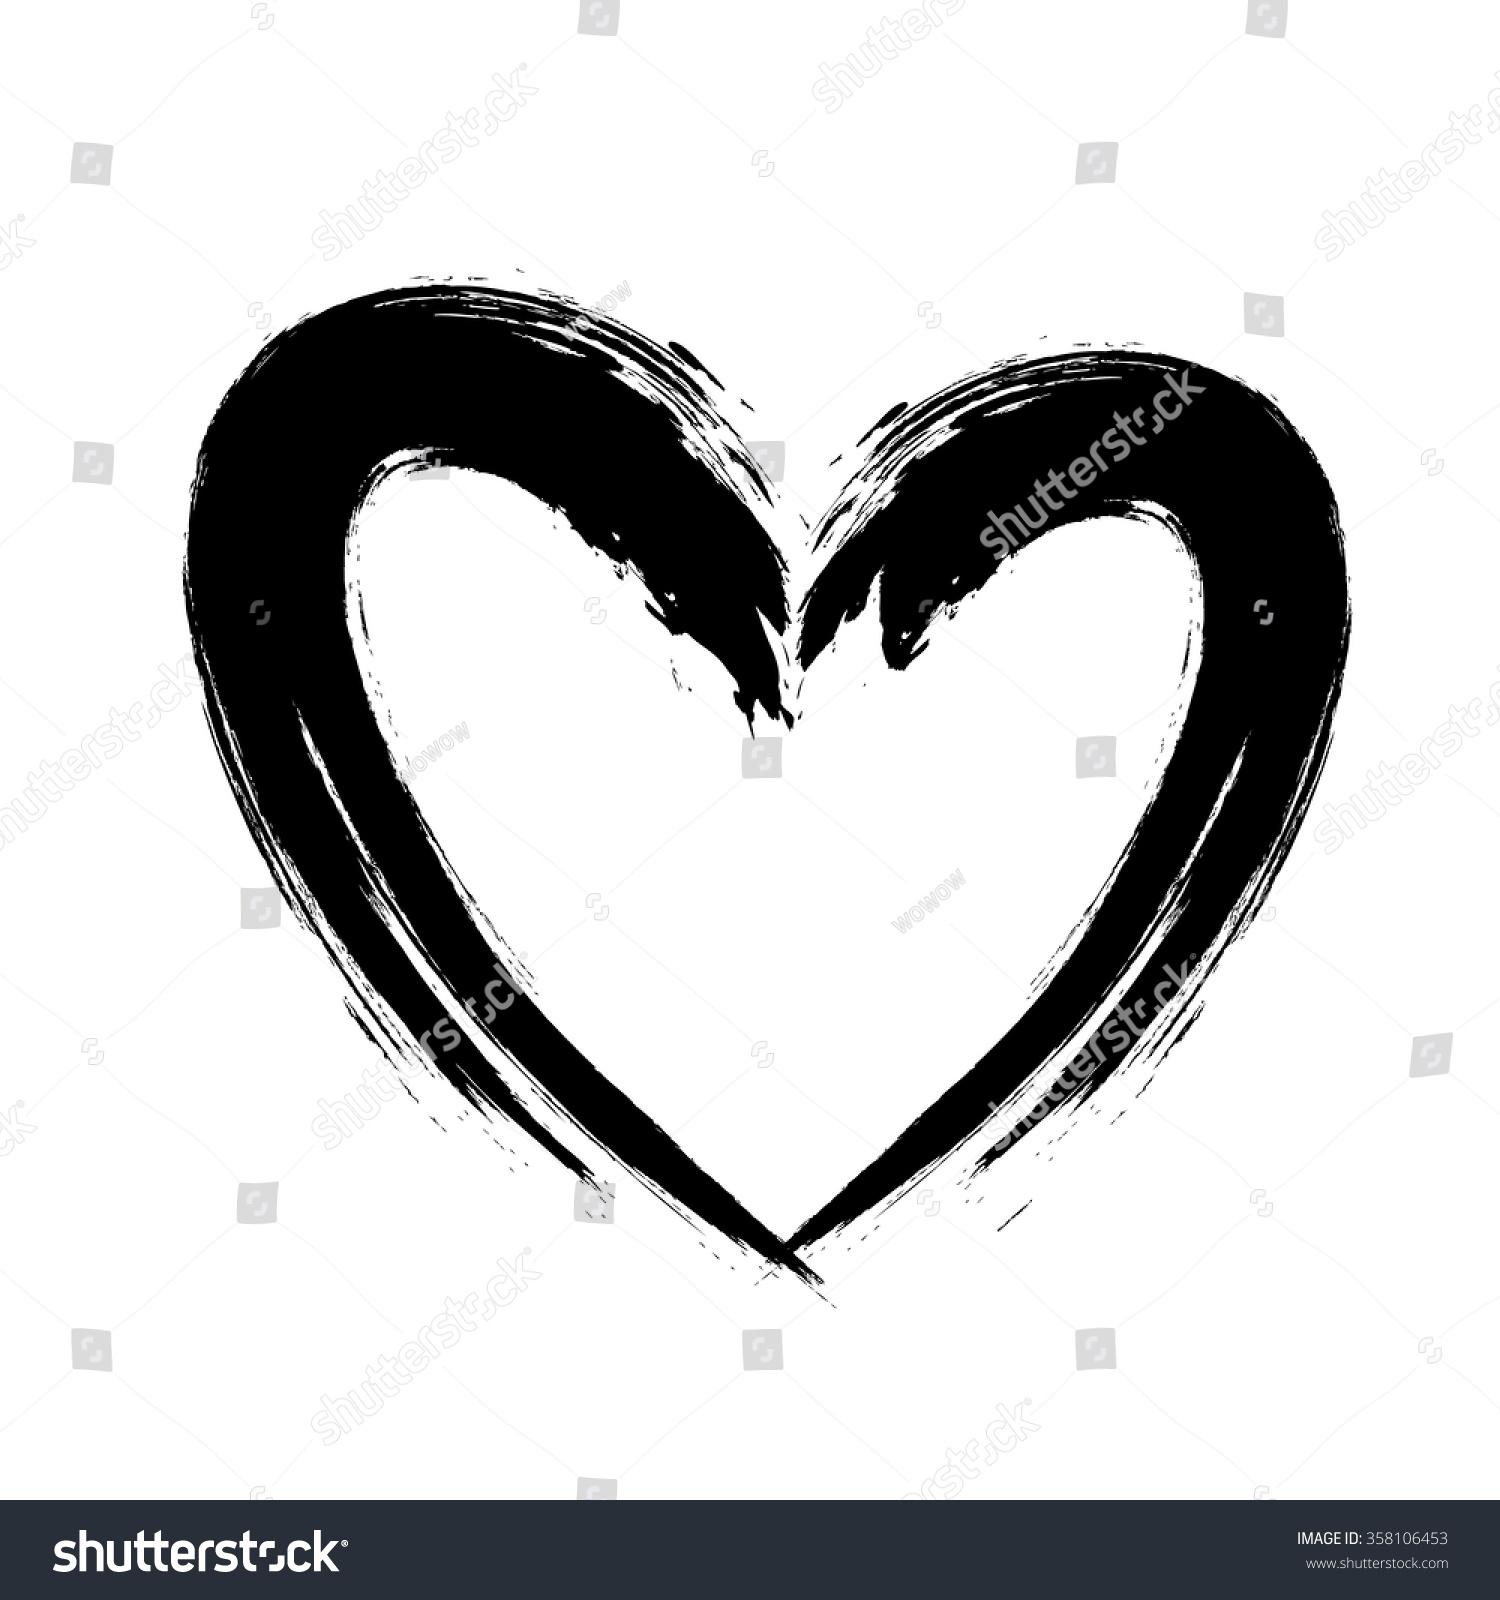 Heart shape design love symbols vector stock vector 358106453 heart shape design for love symbols vector illustration buycottarizona